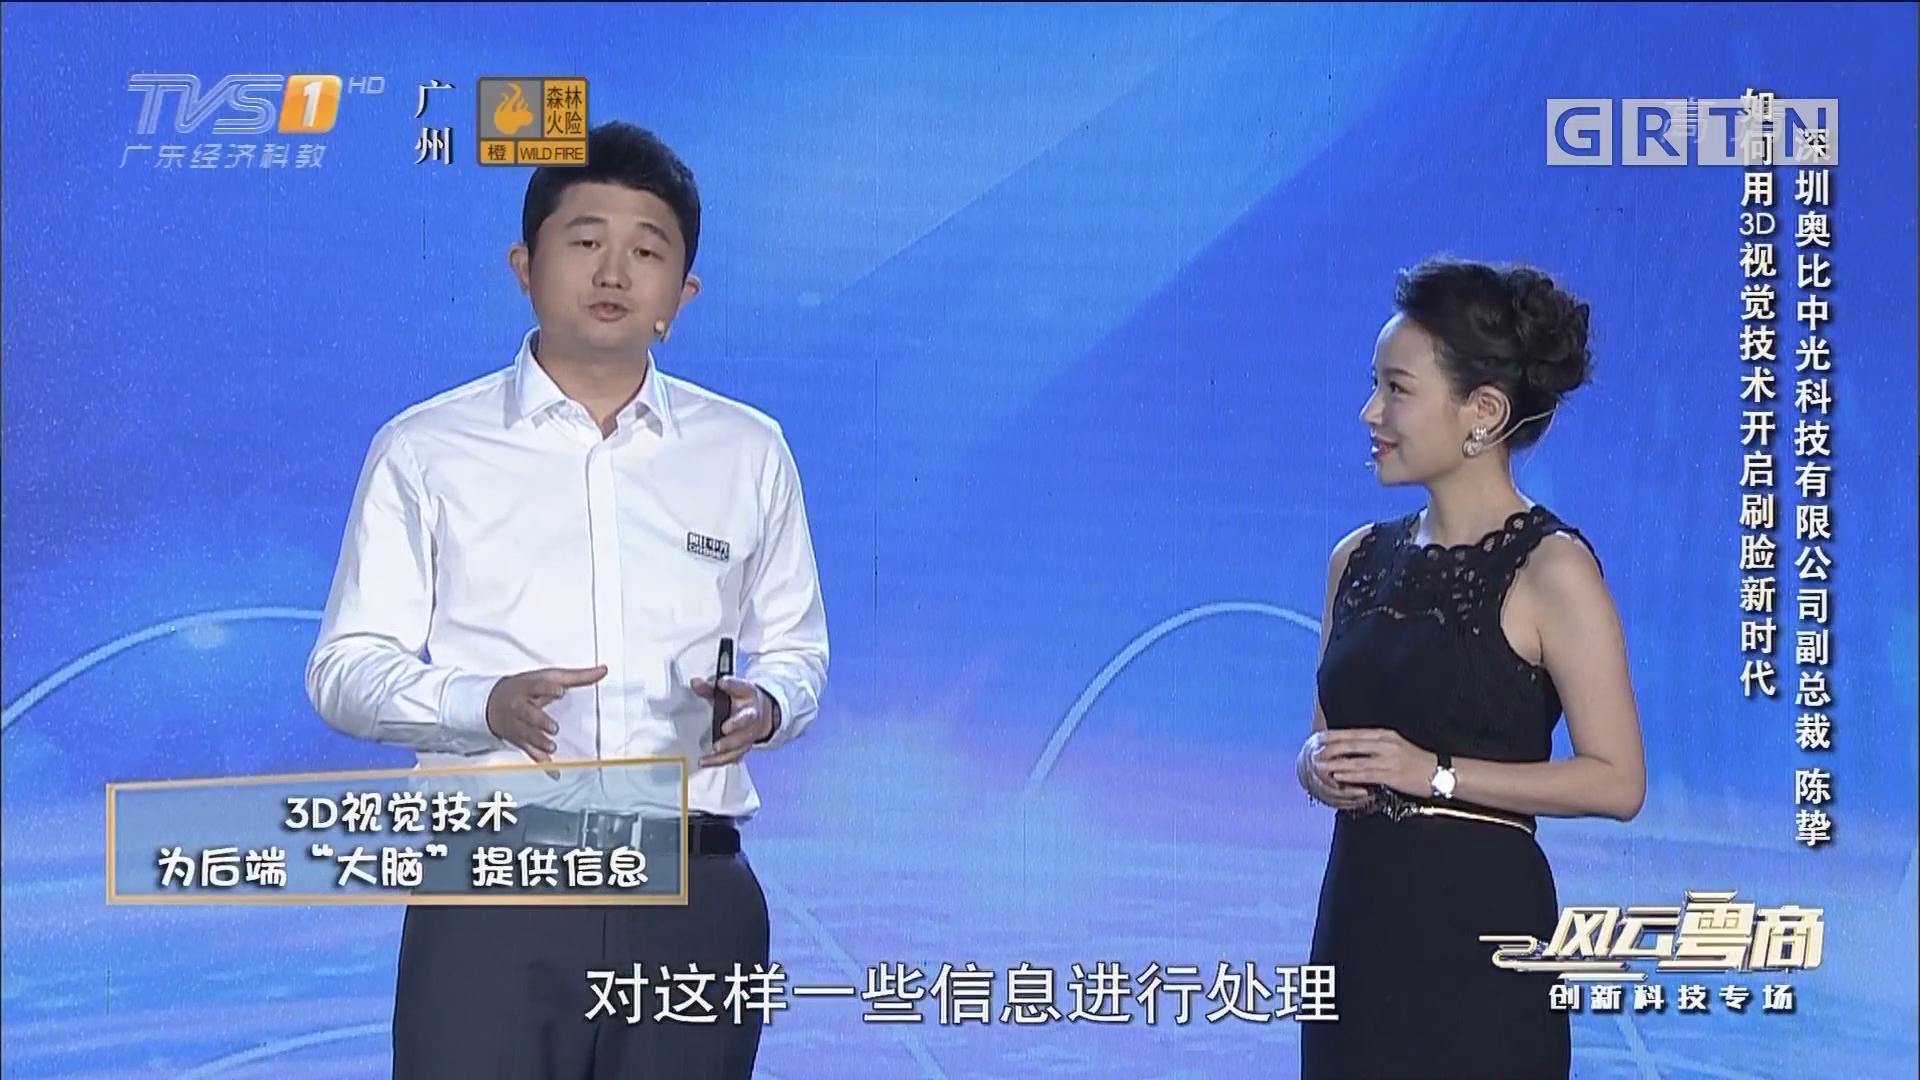 [HD][2019-01-26]风云粤商:如何用3D视觉技术开启刷脸新时代